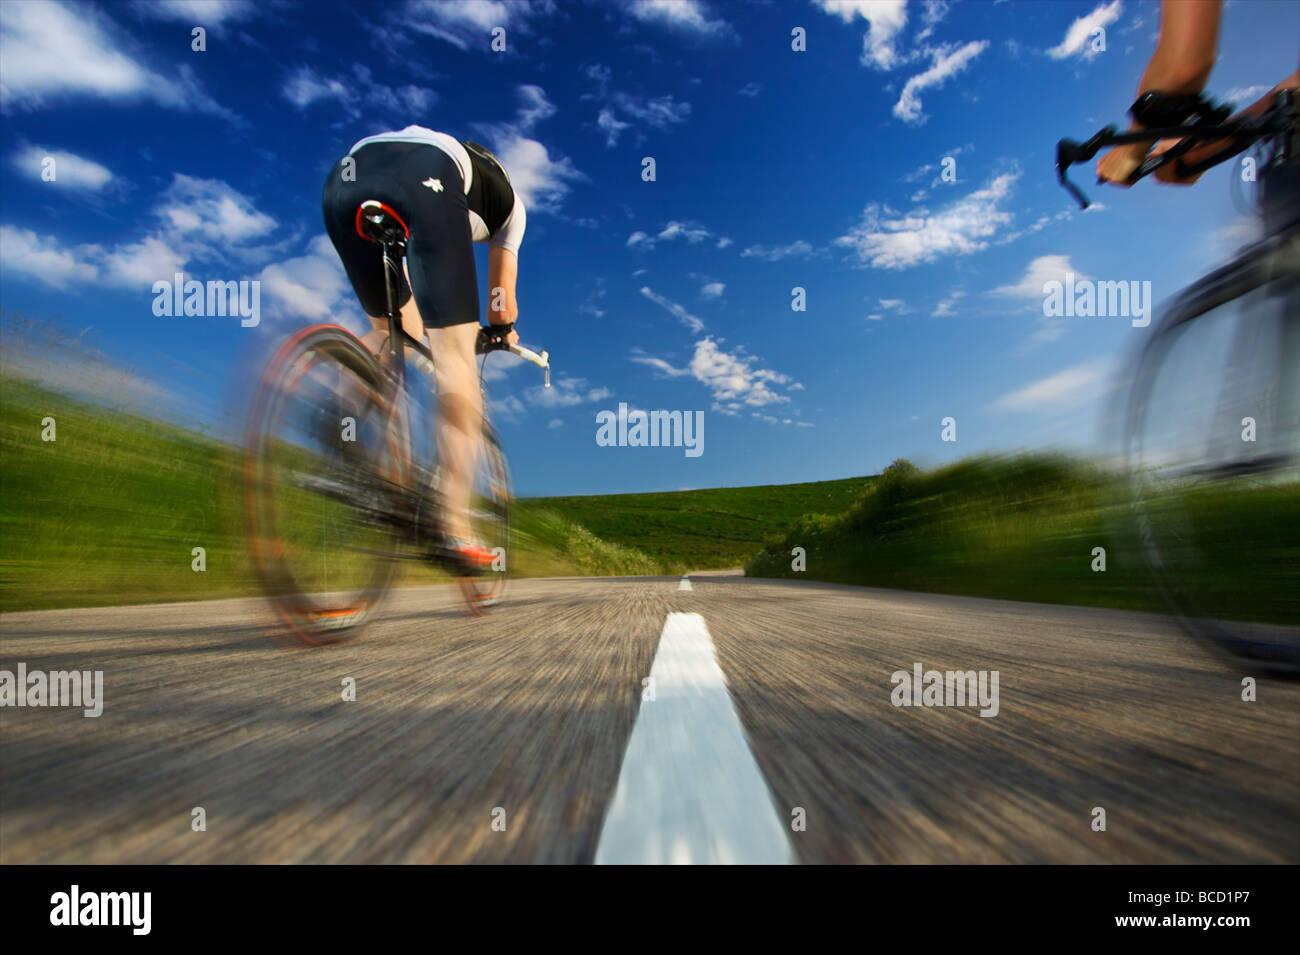 World Quadrathlon champion 2008 - Andrew Byatt cycles past on the Cornwall coastal road - Stock Image